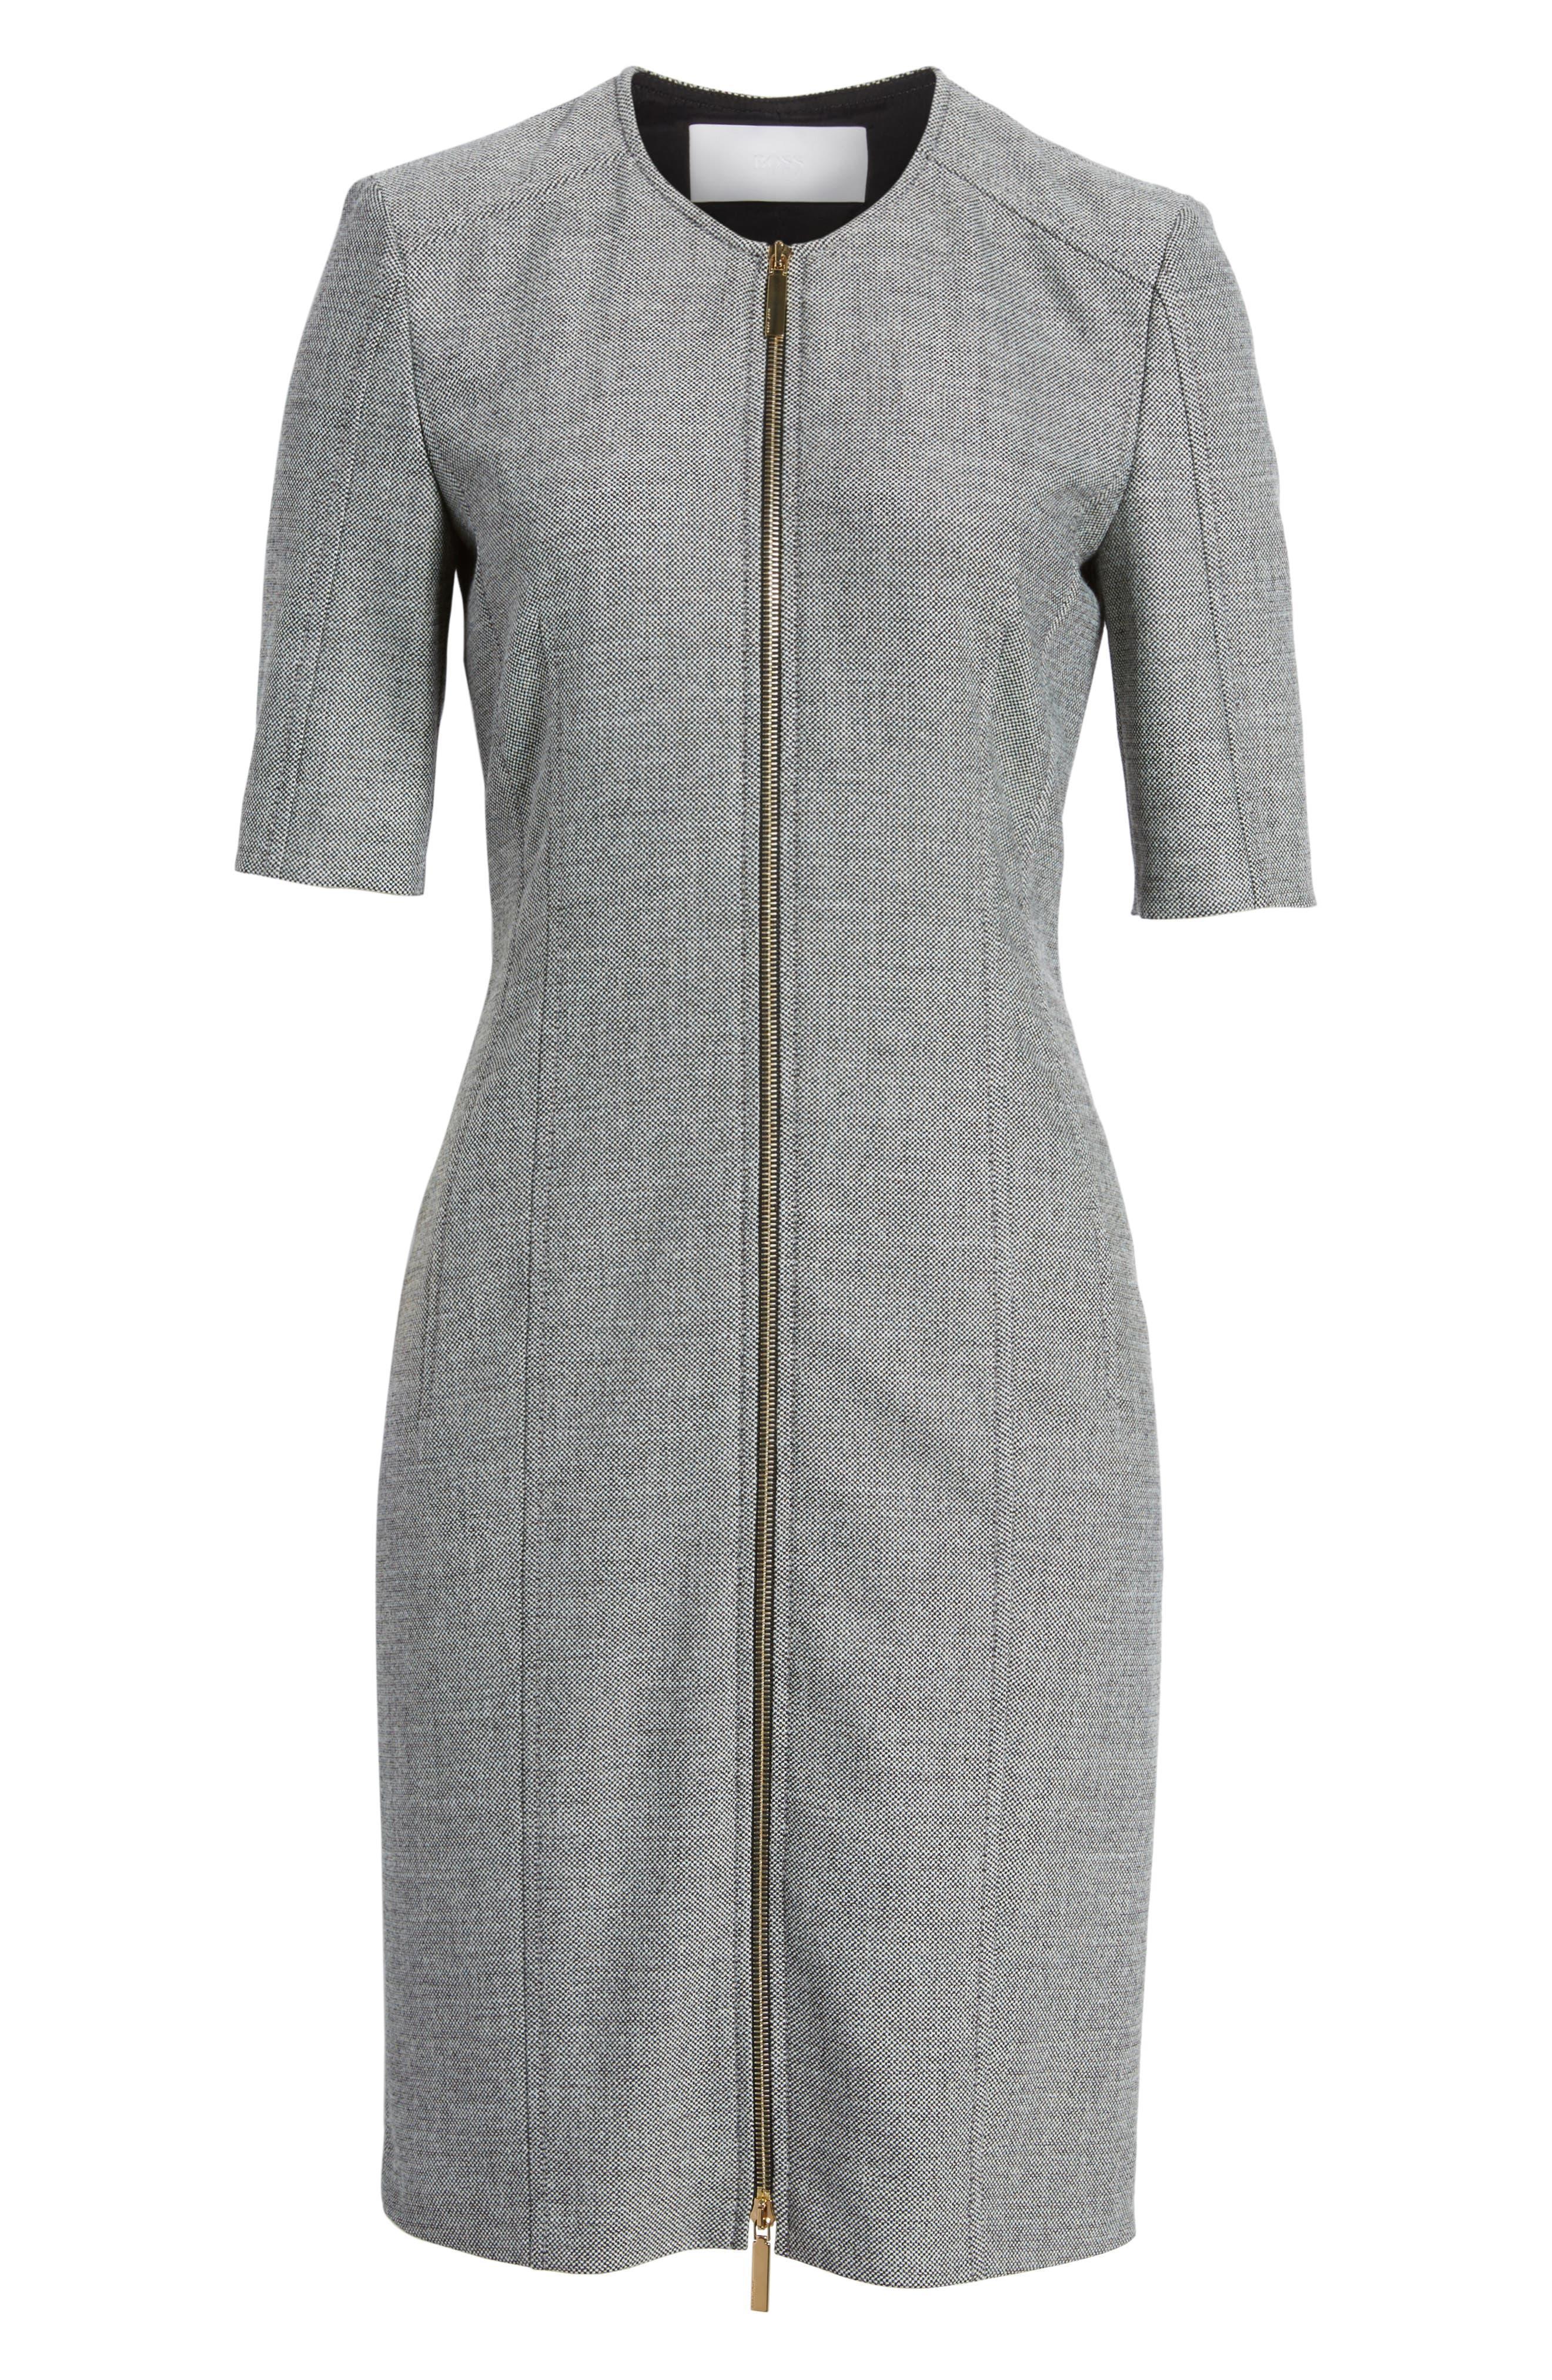 Demirana Zip Front Sheath Dress,                             Alternate thumbnail 6, color,